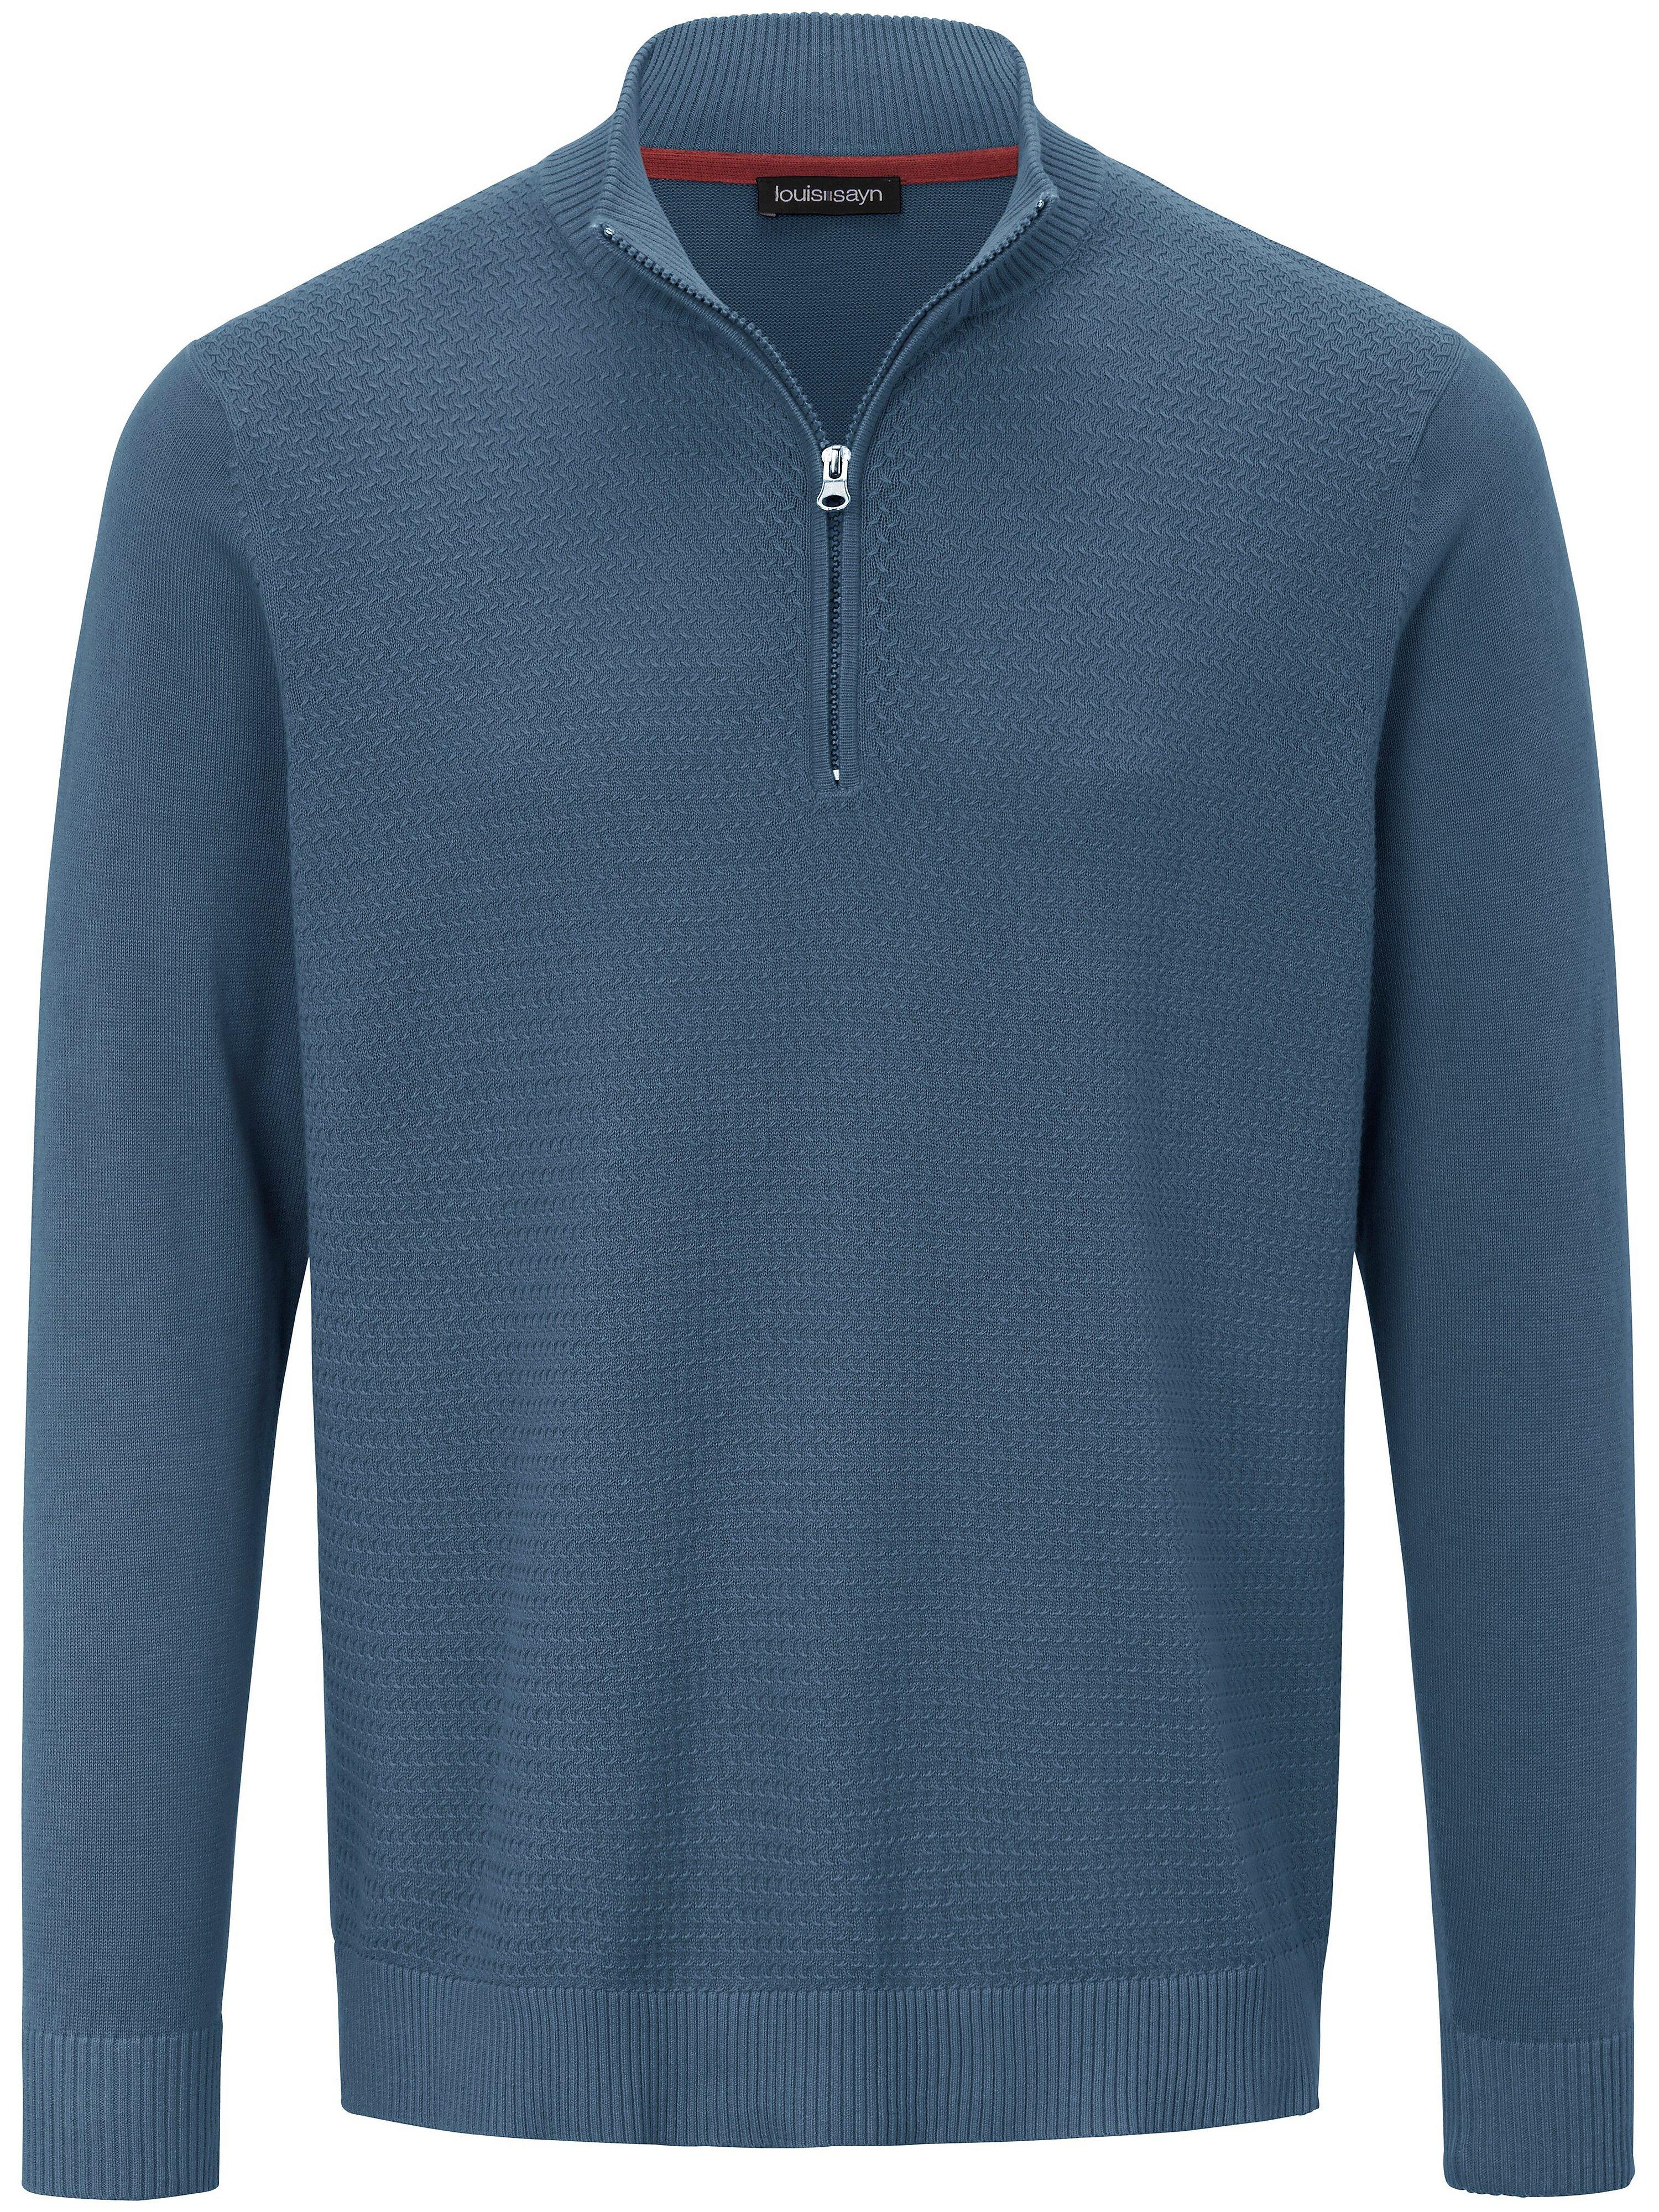 Le pull 100% coton  Louis Sayn bleu